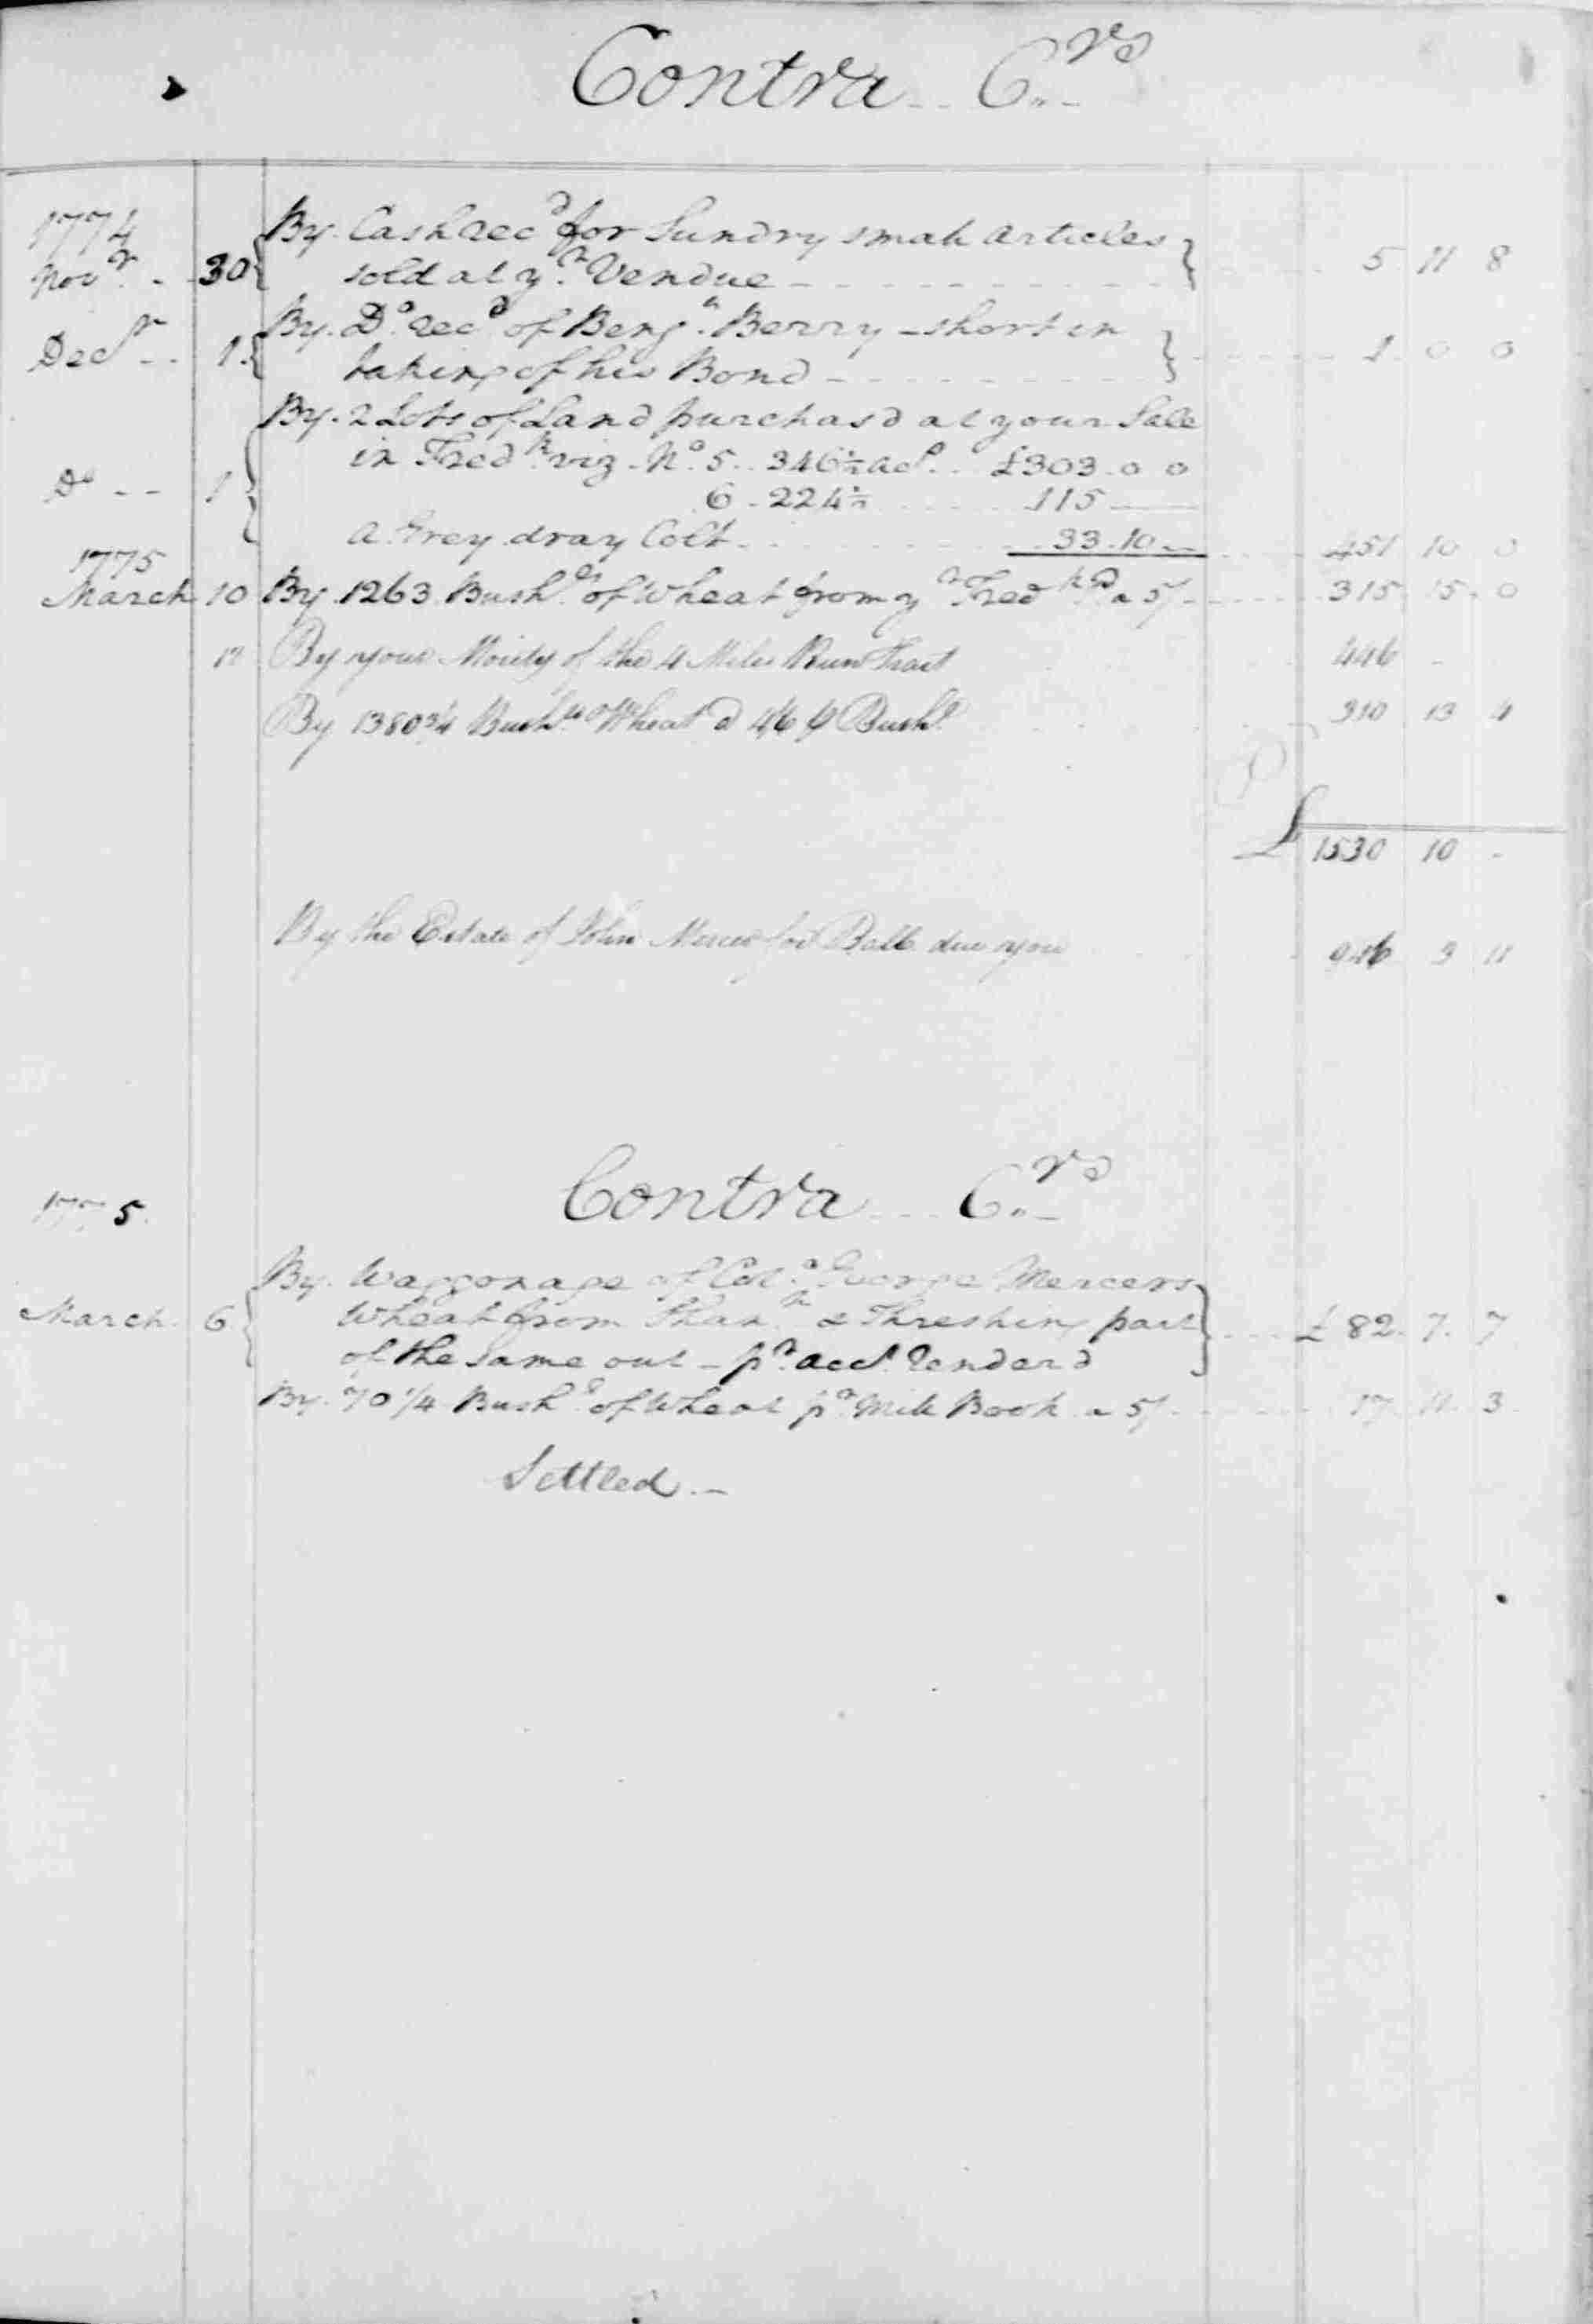 Ledger B, folio 129, right side